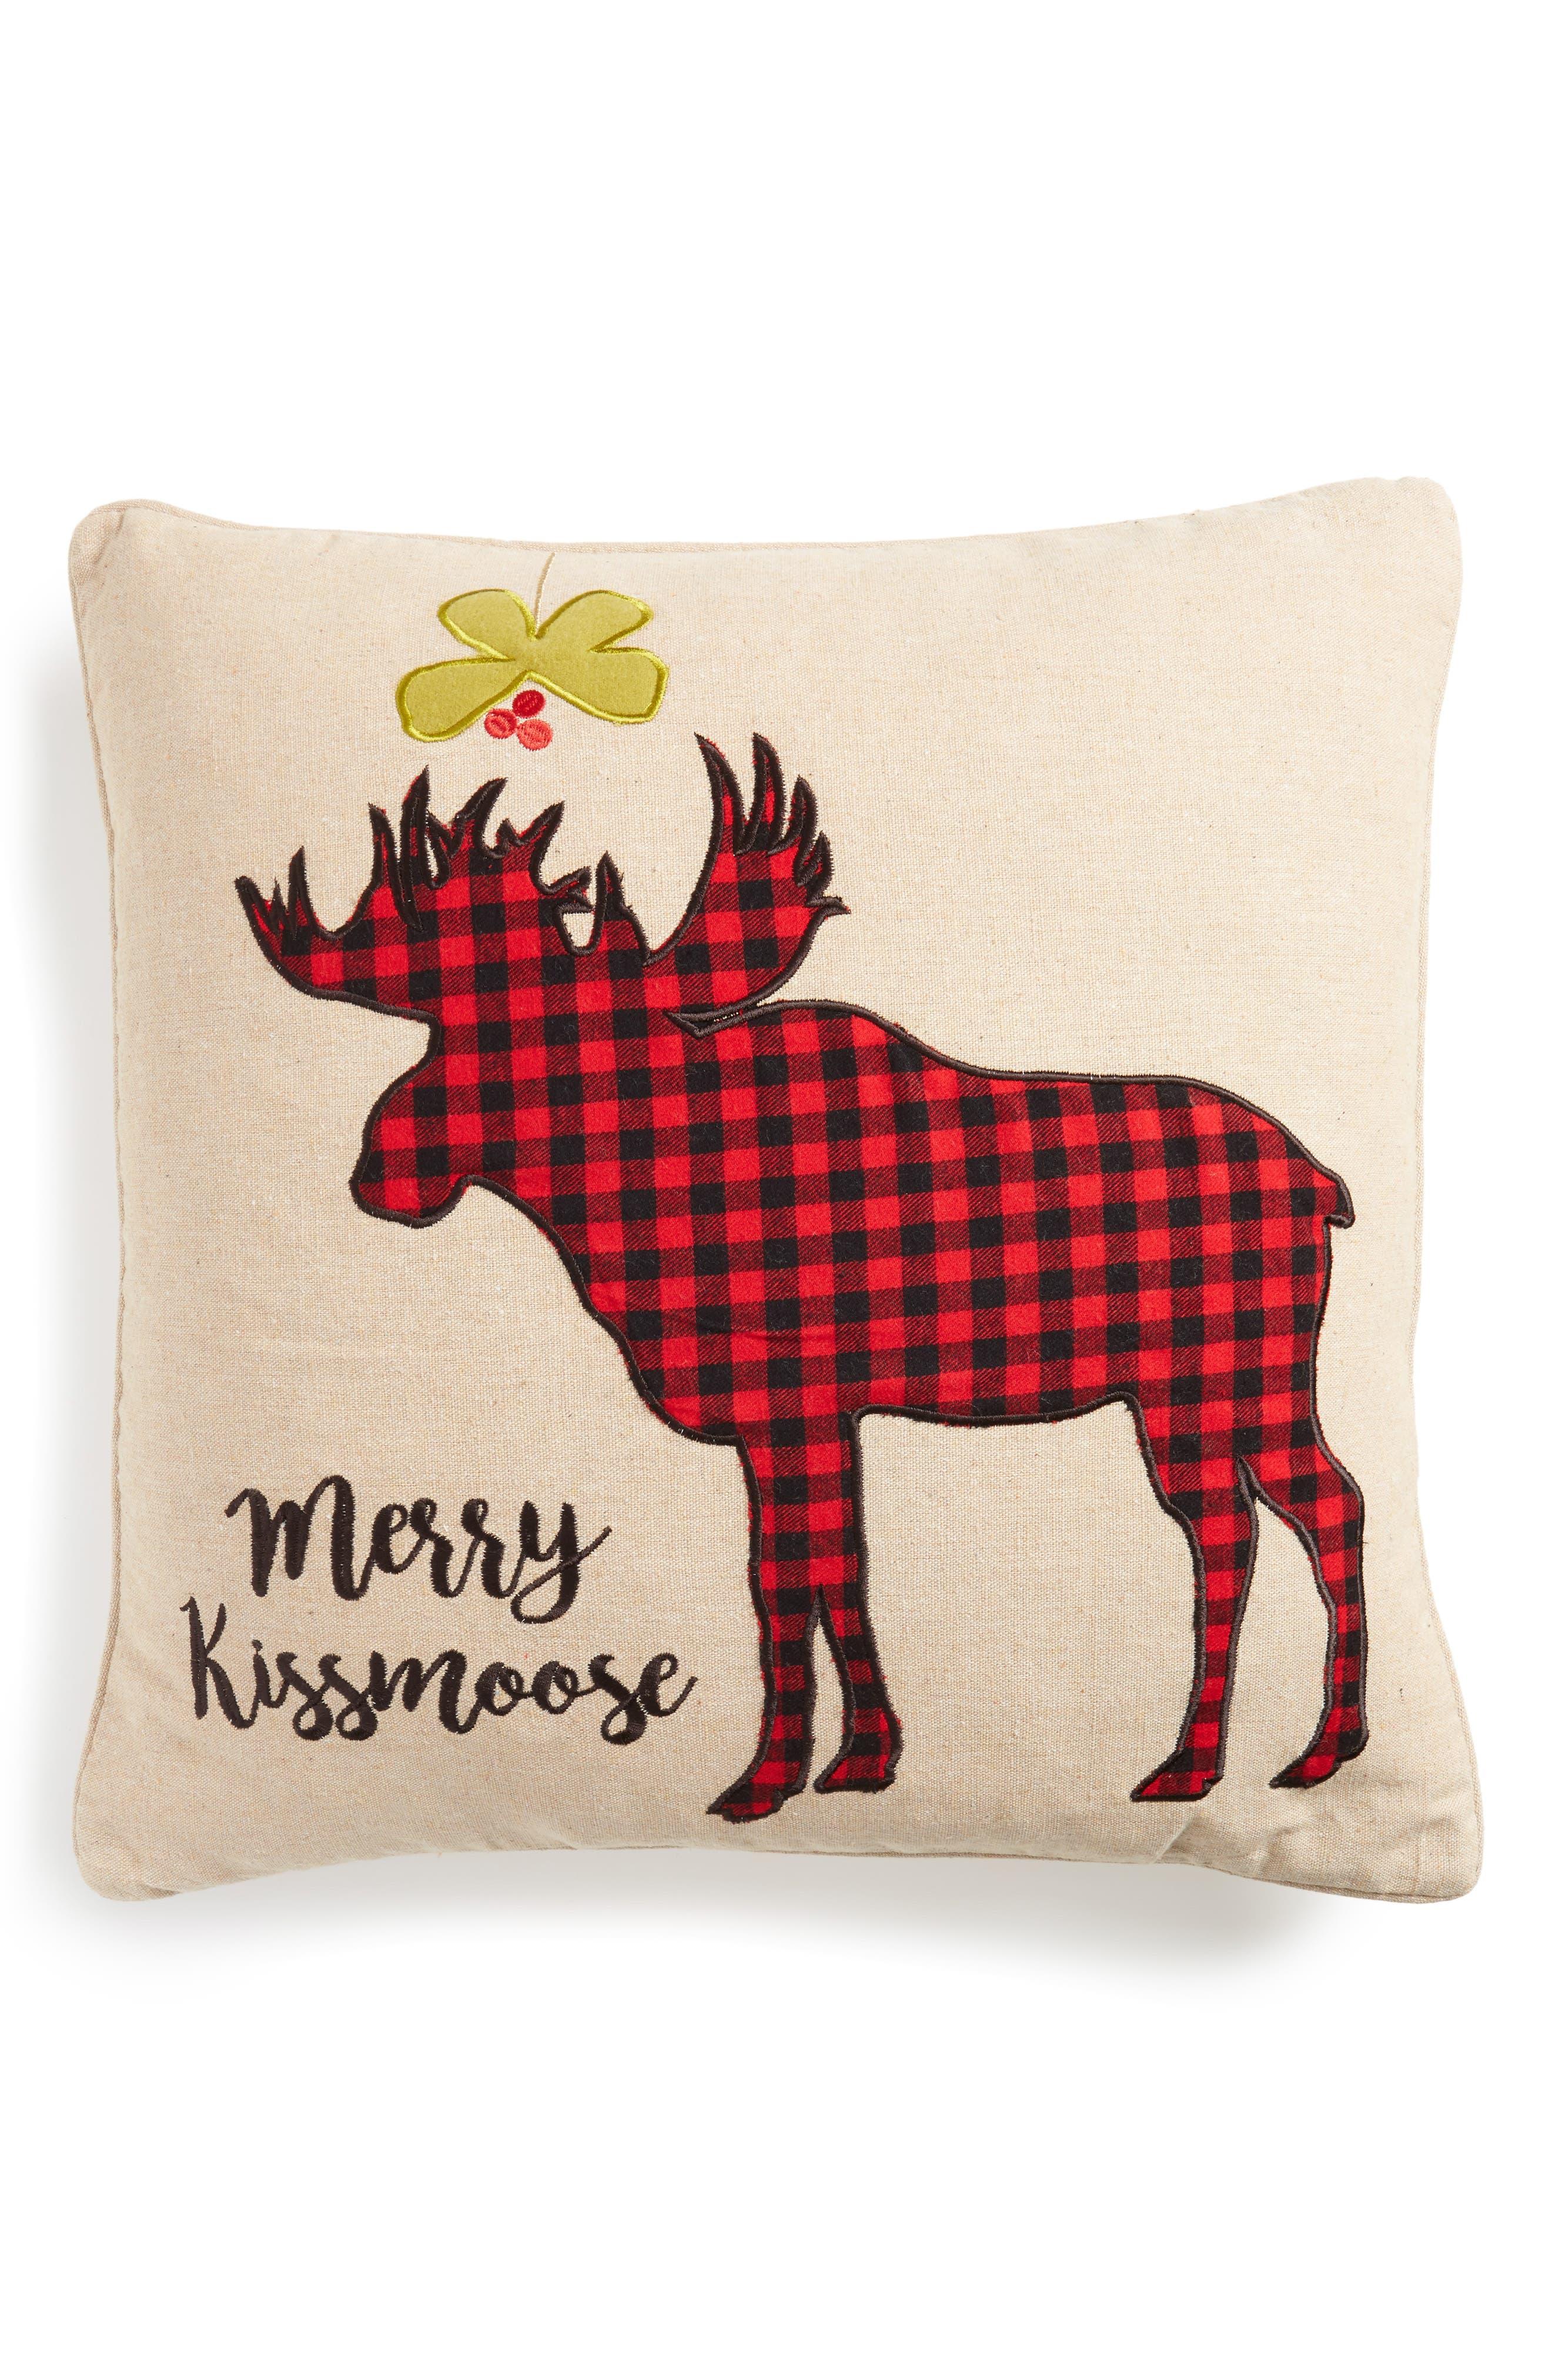 Plaid Merry Kissmoose Accent Pillow,                         Main,                         color, Natural